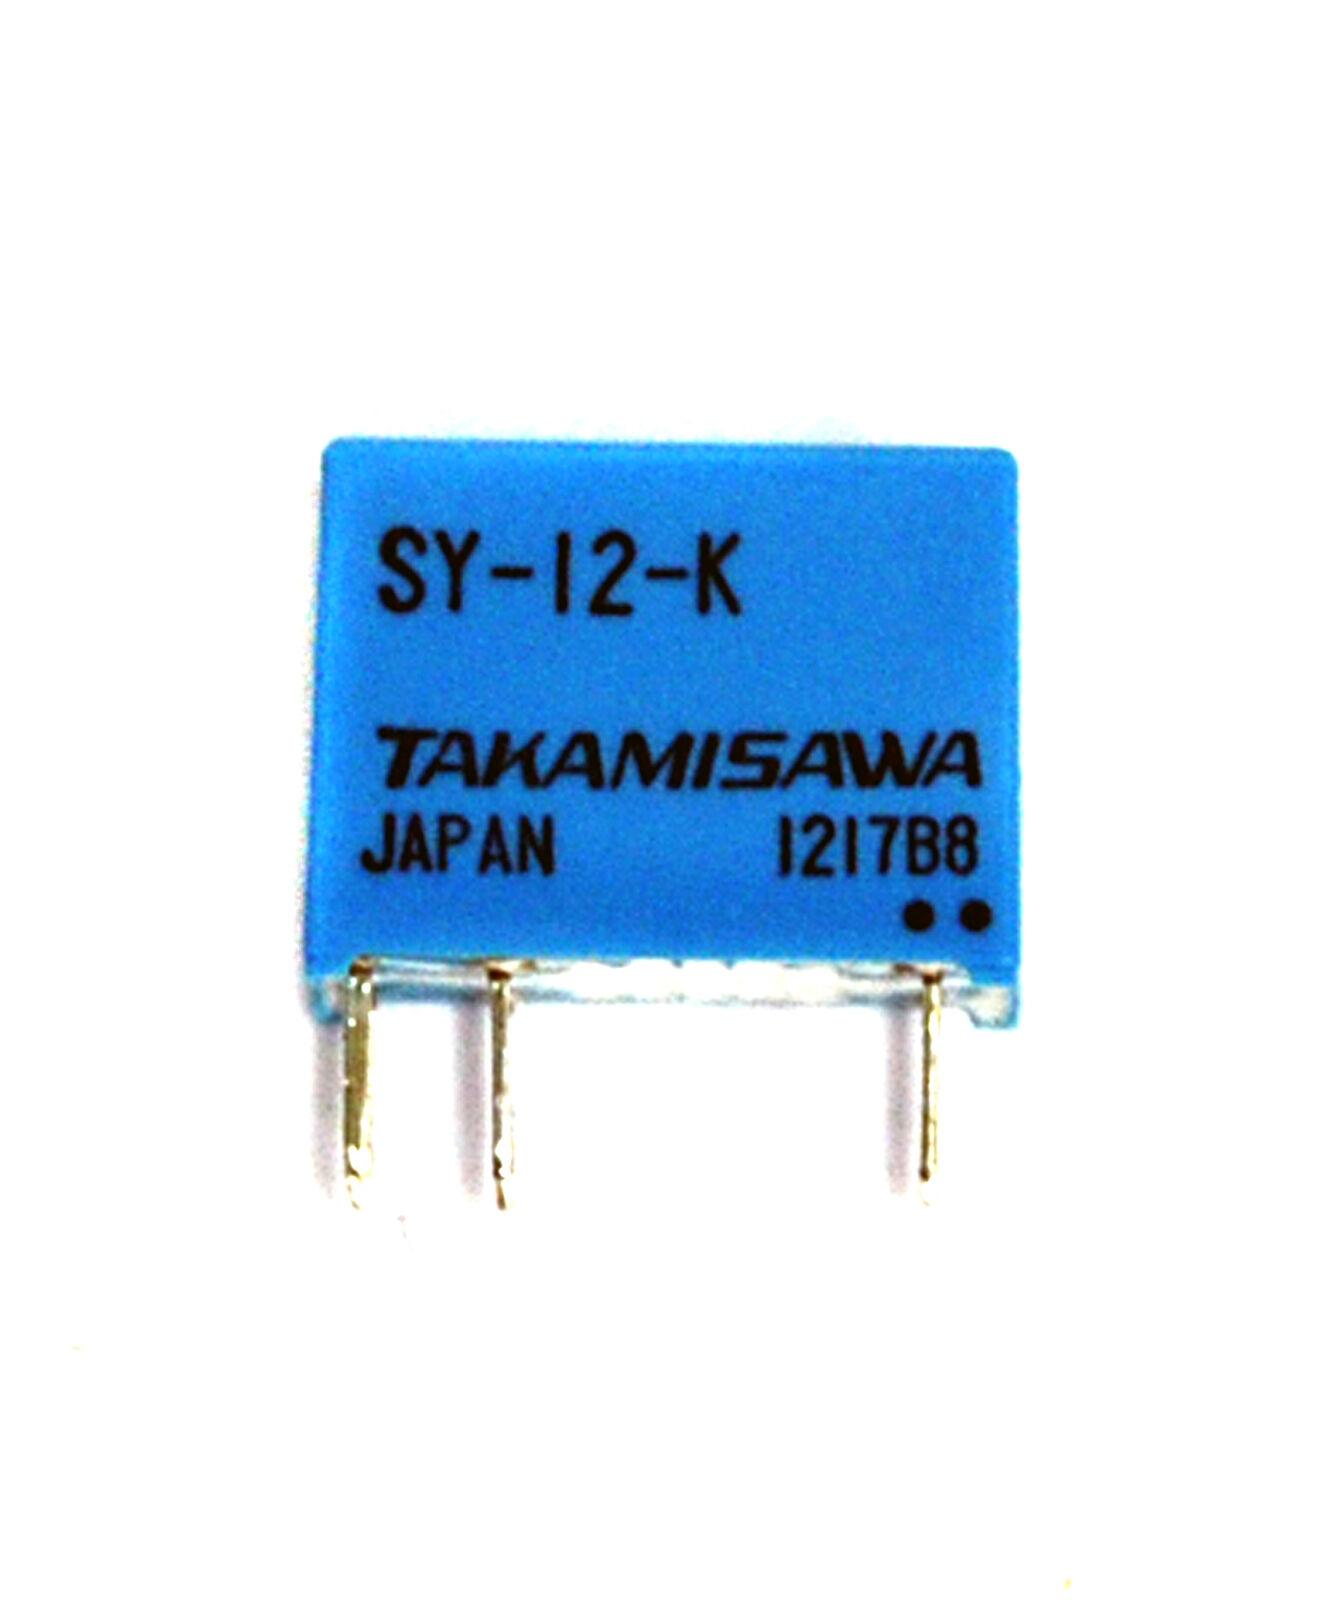 16Vdc *New* * Lot Of 2 Electric Motor 16V Dc 28500 Rpm 20W Oem